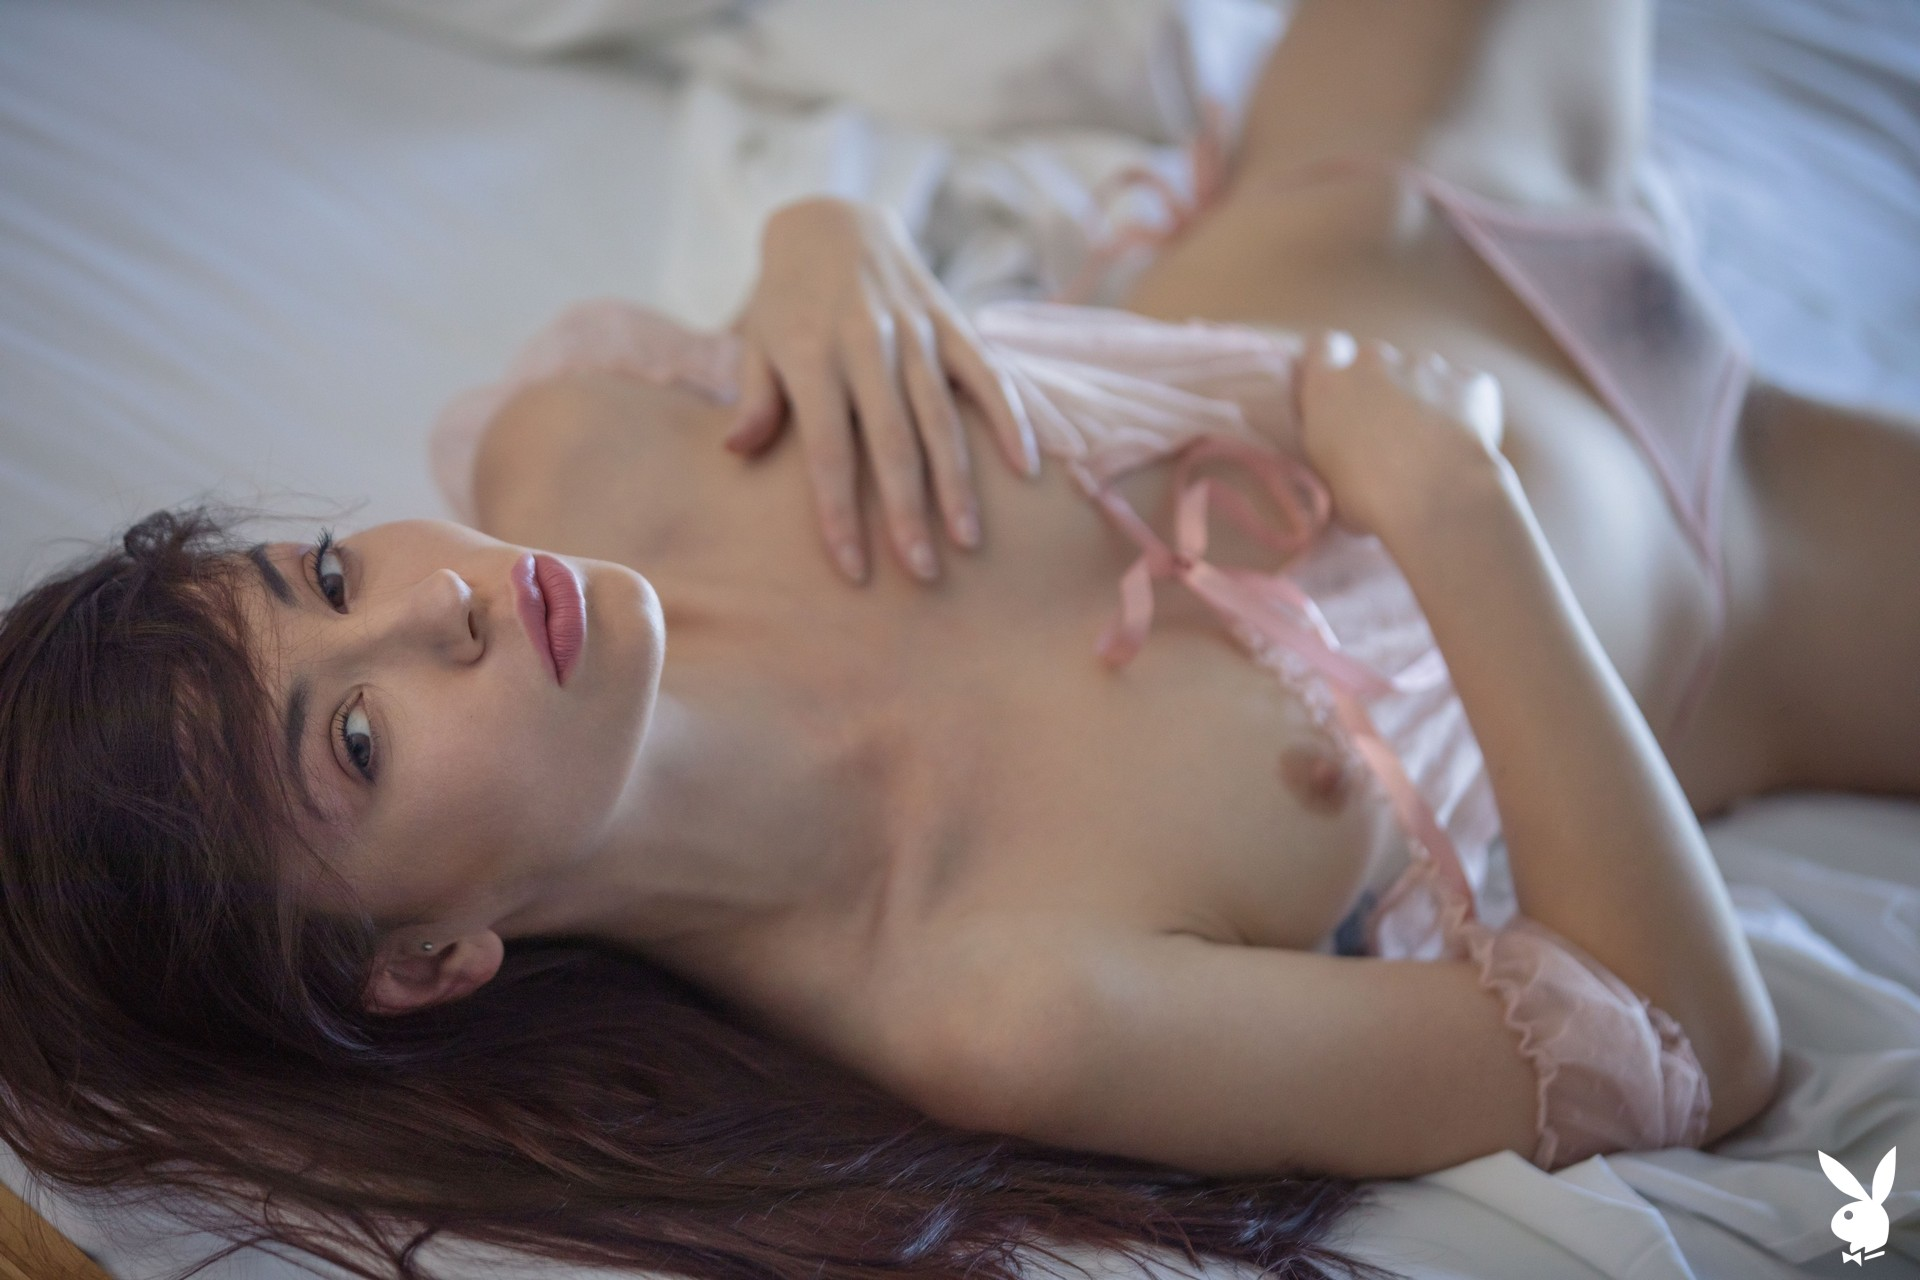 Elilith Noir In Tucked Away Playboy Plus (10)